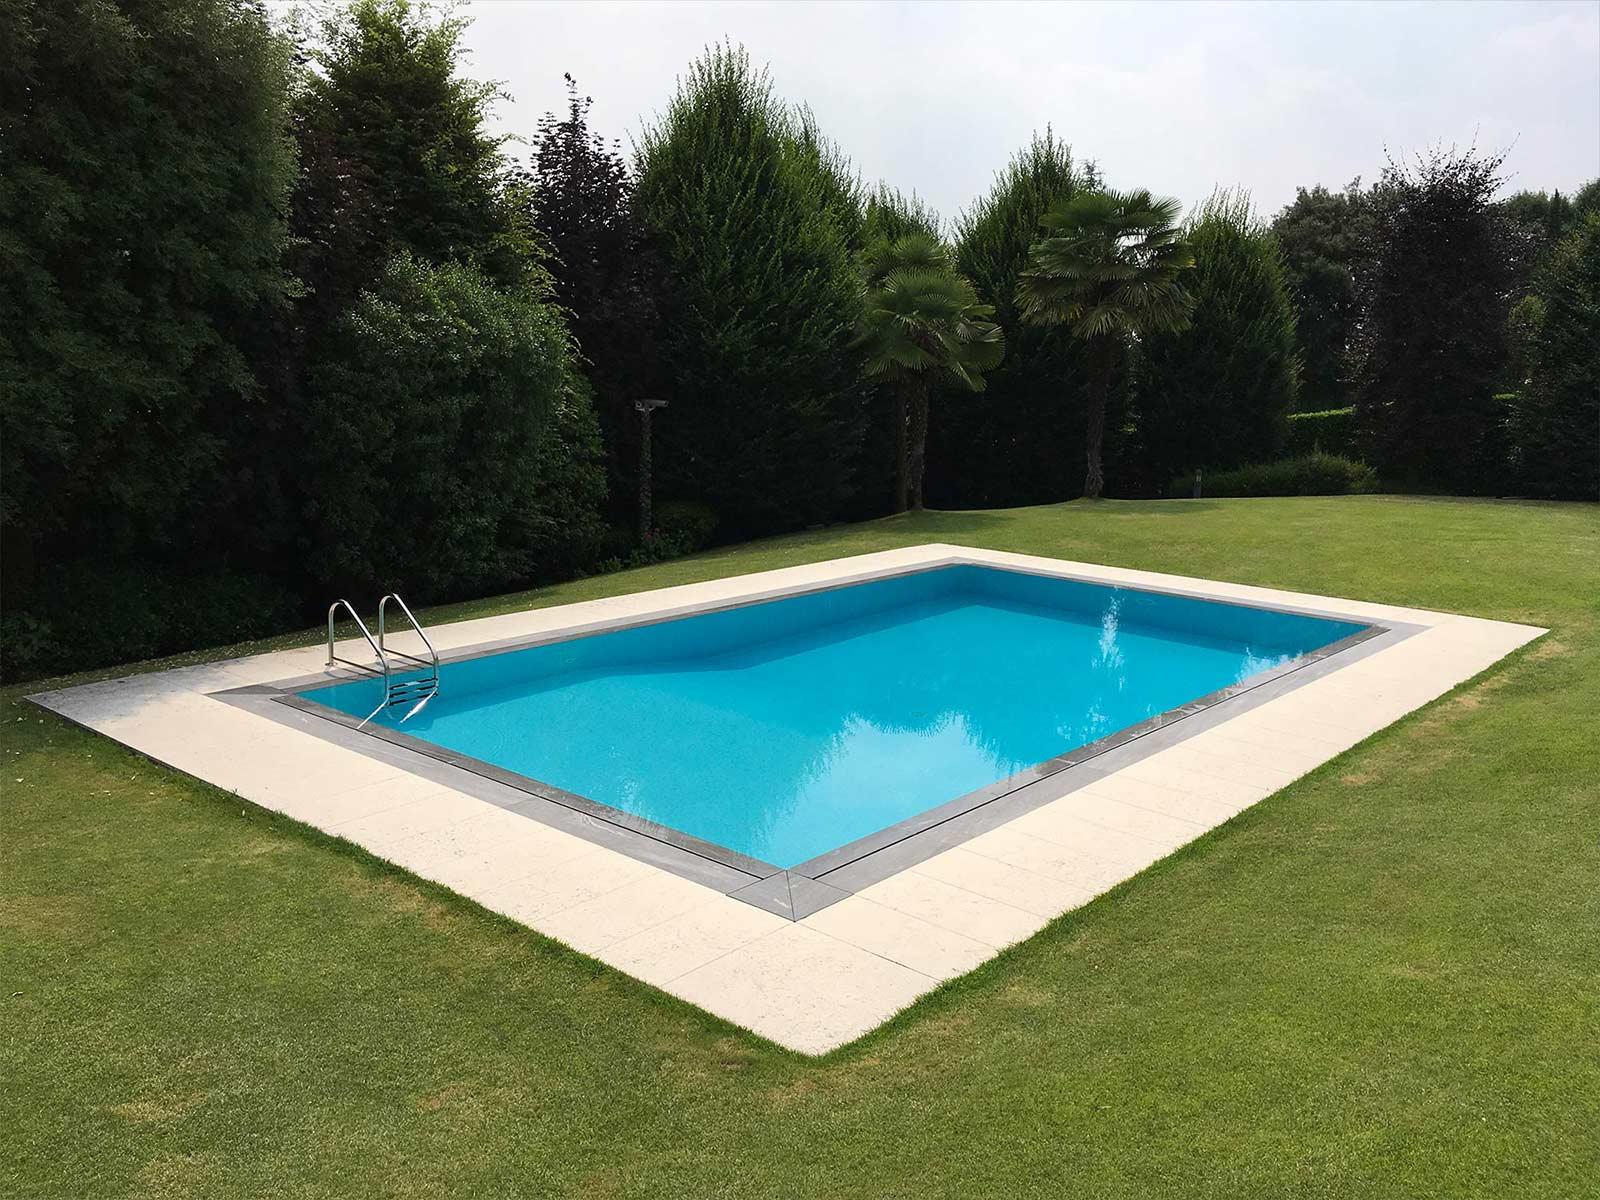 piscina a sfioro a fessura